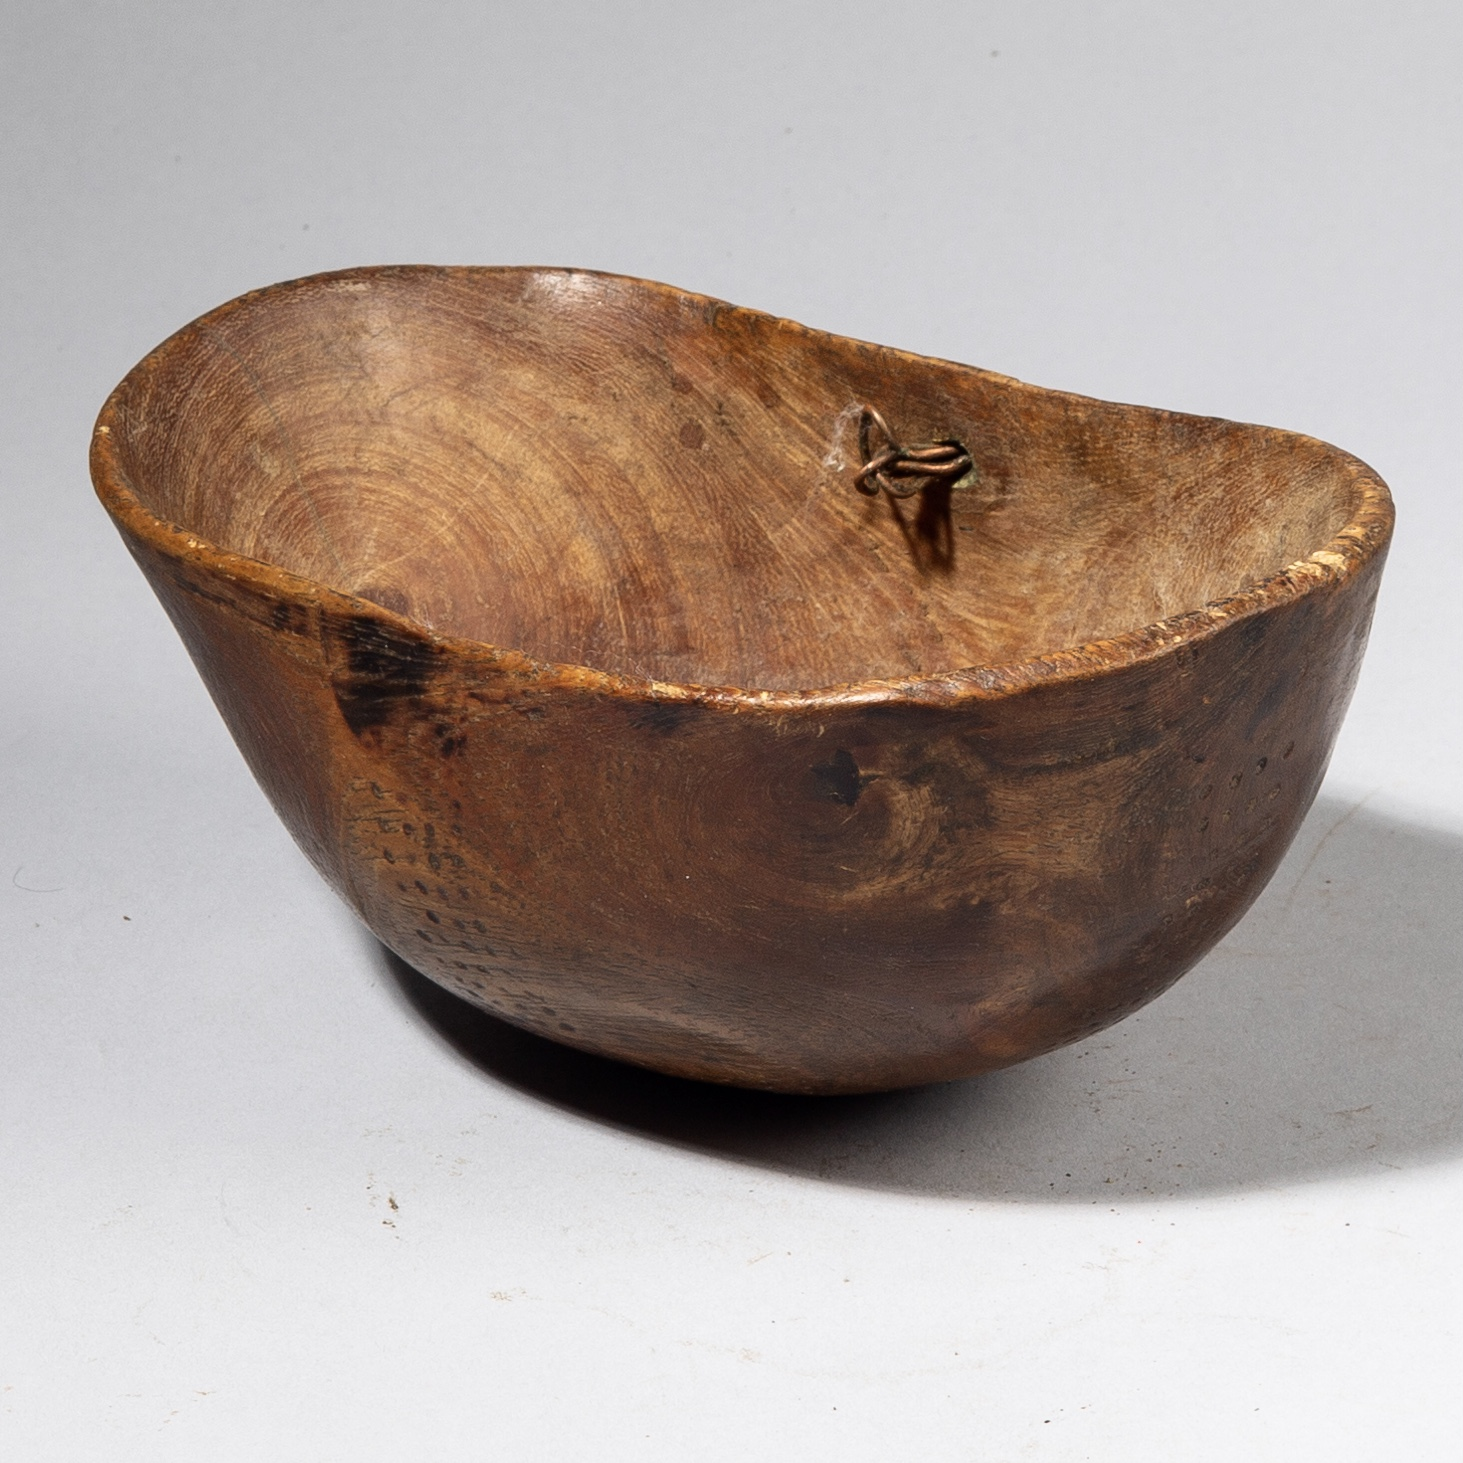 A GENEROUS TURKANA BOWL FROM KENYA ( No 3873 )